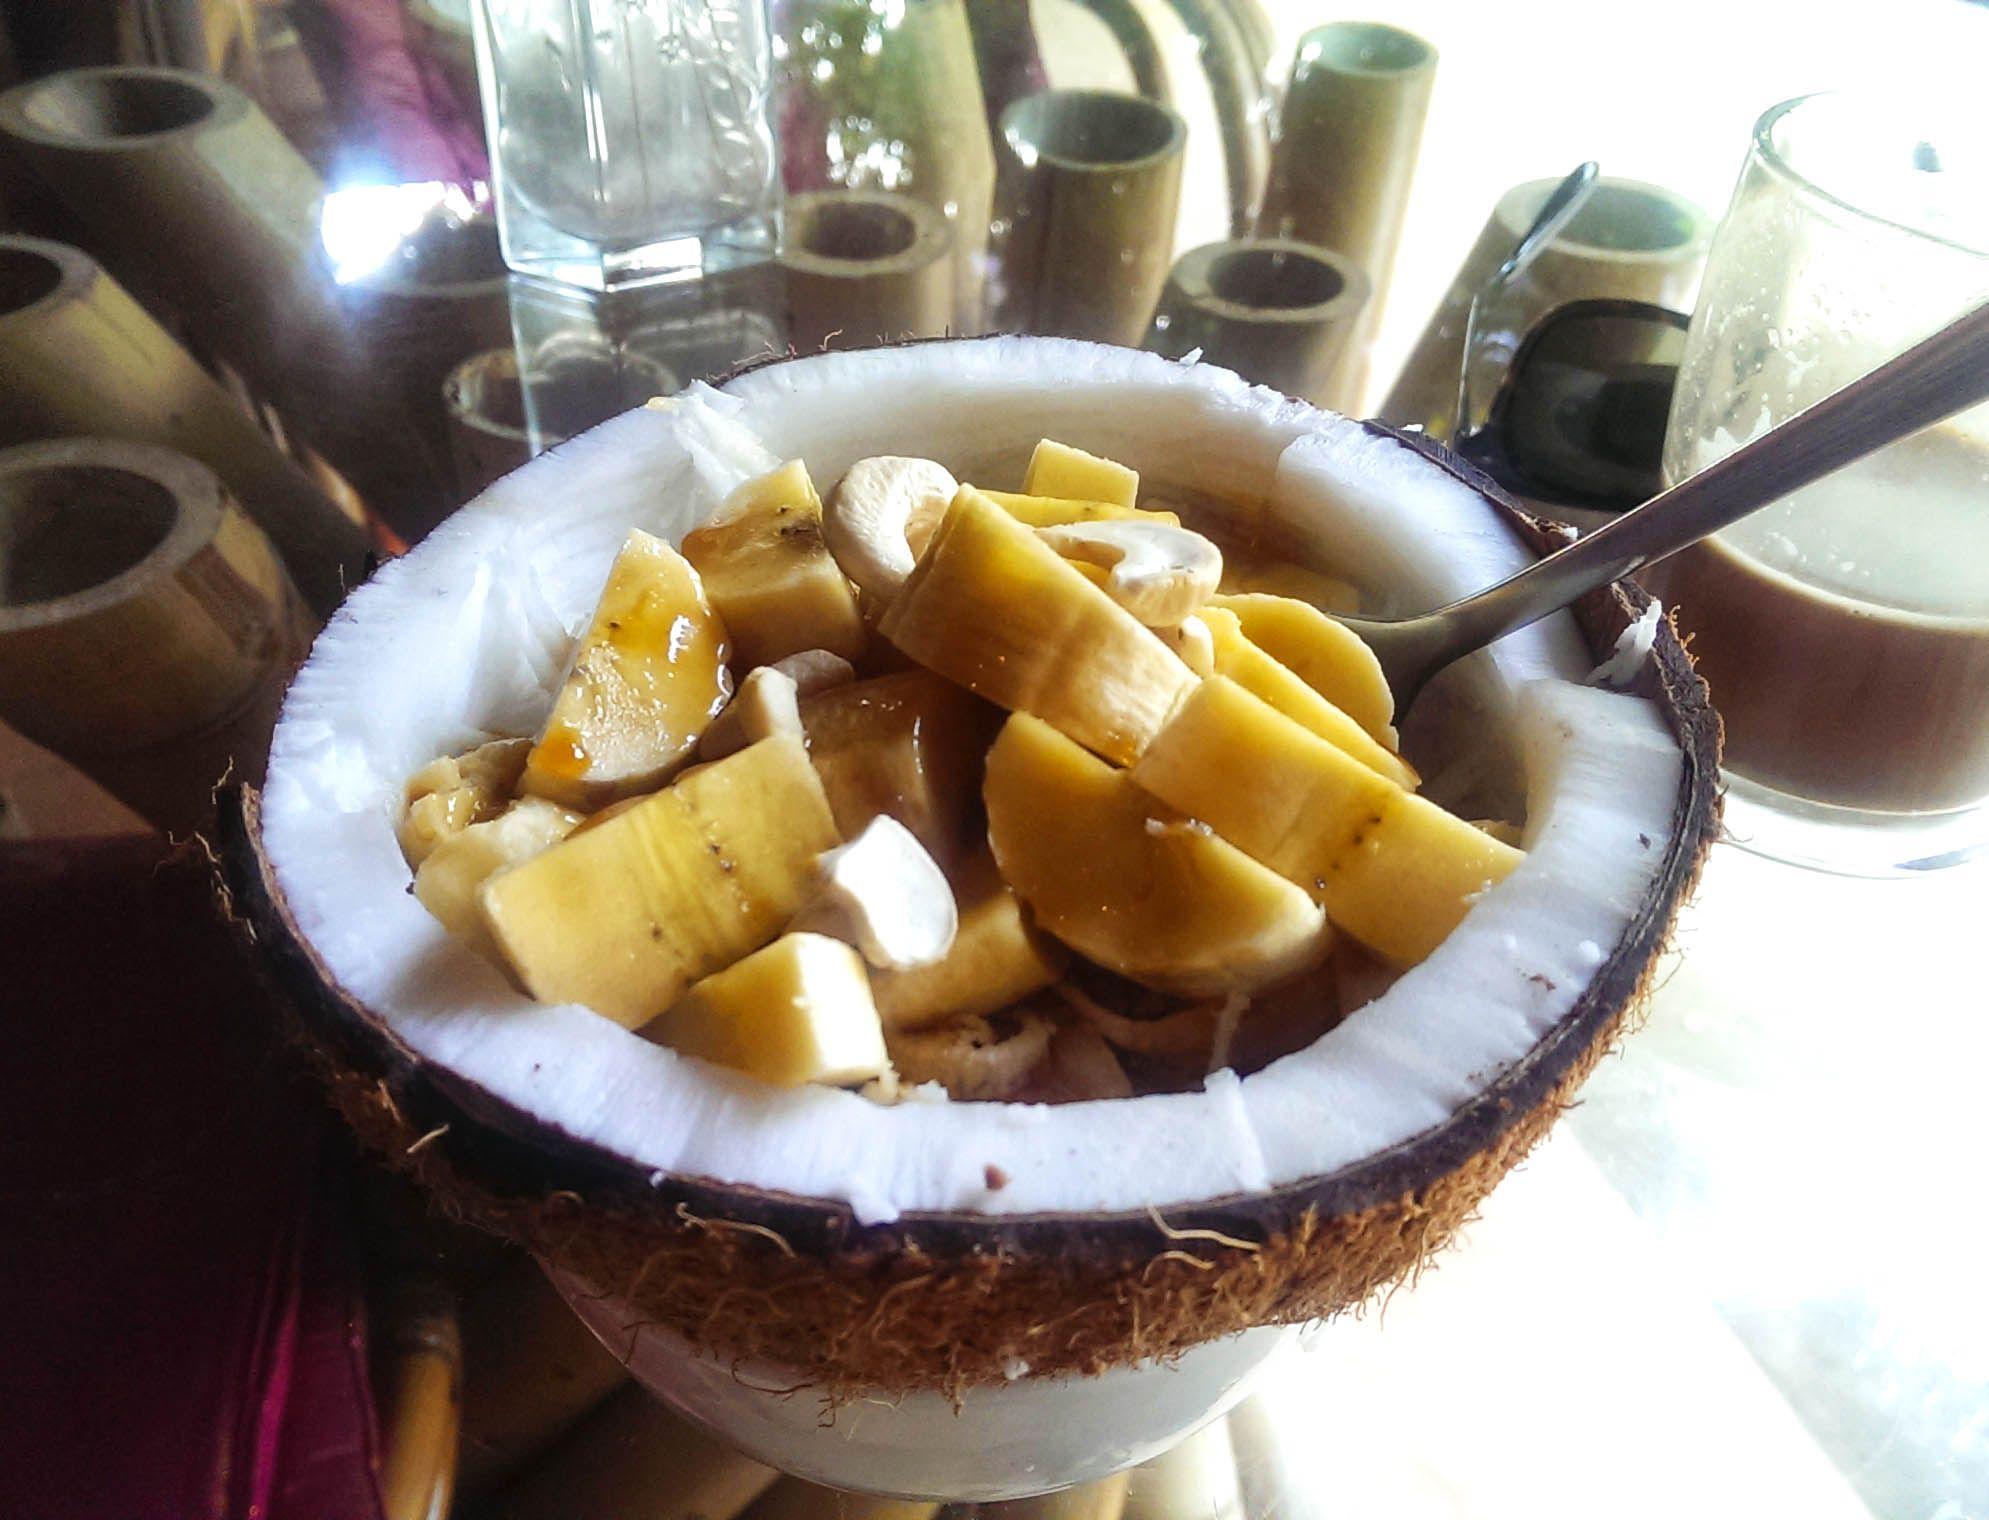 Yellow Flower Cafe Penestanan, Ubud Set in leafy